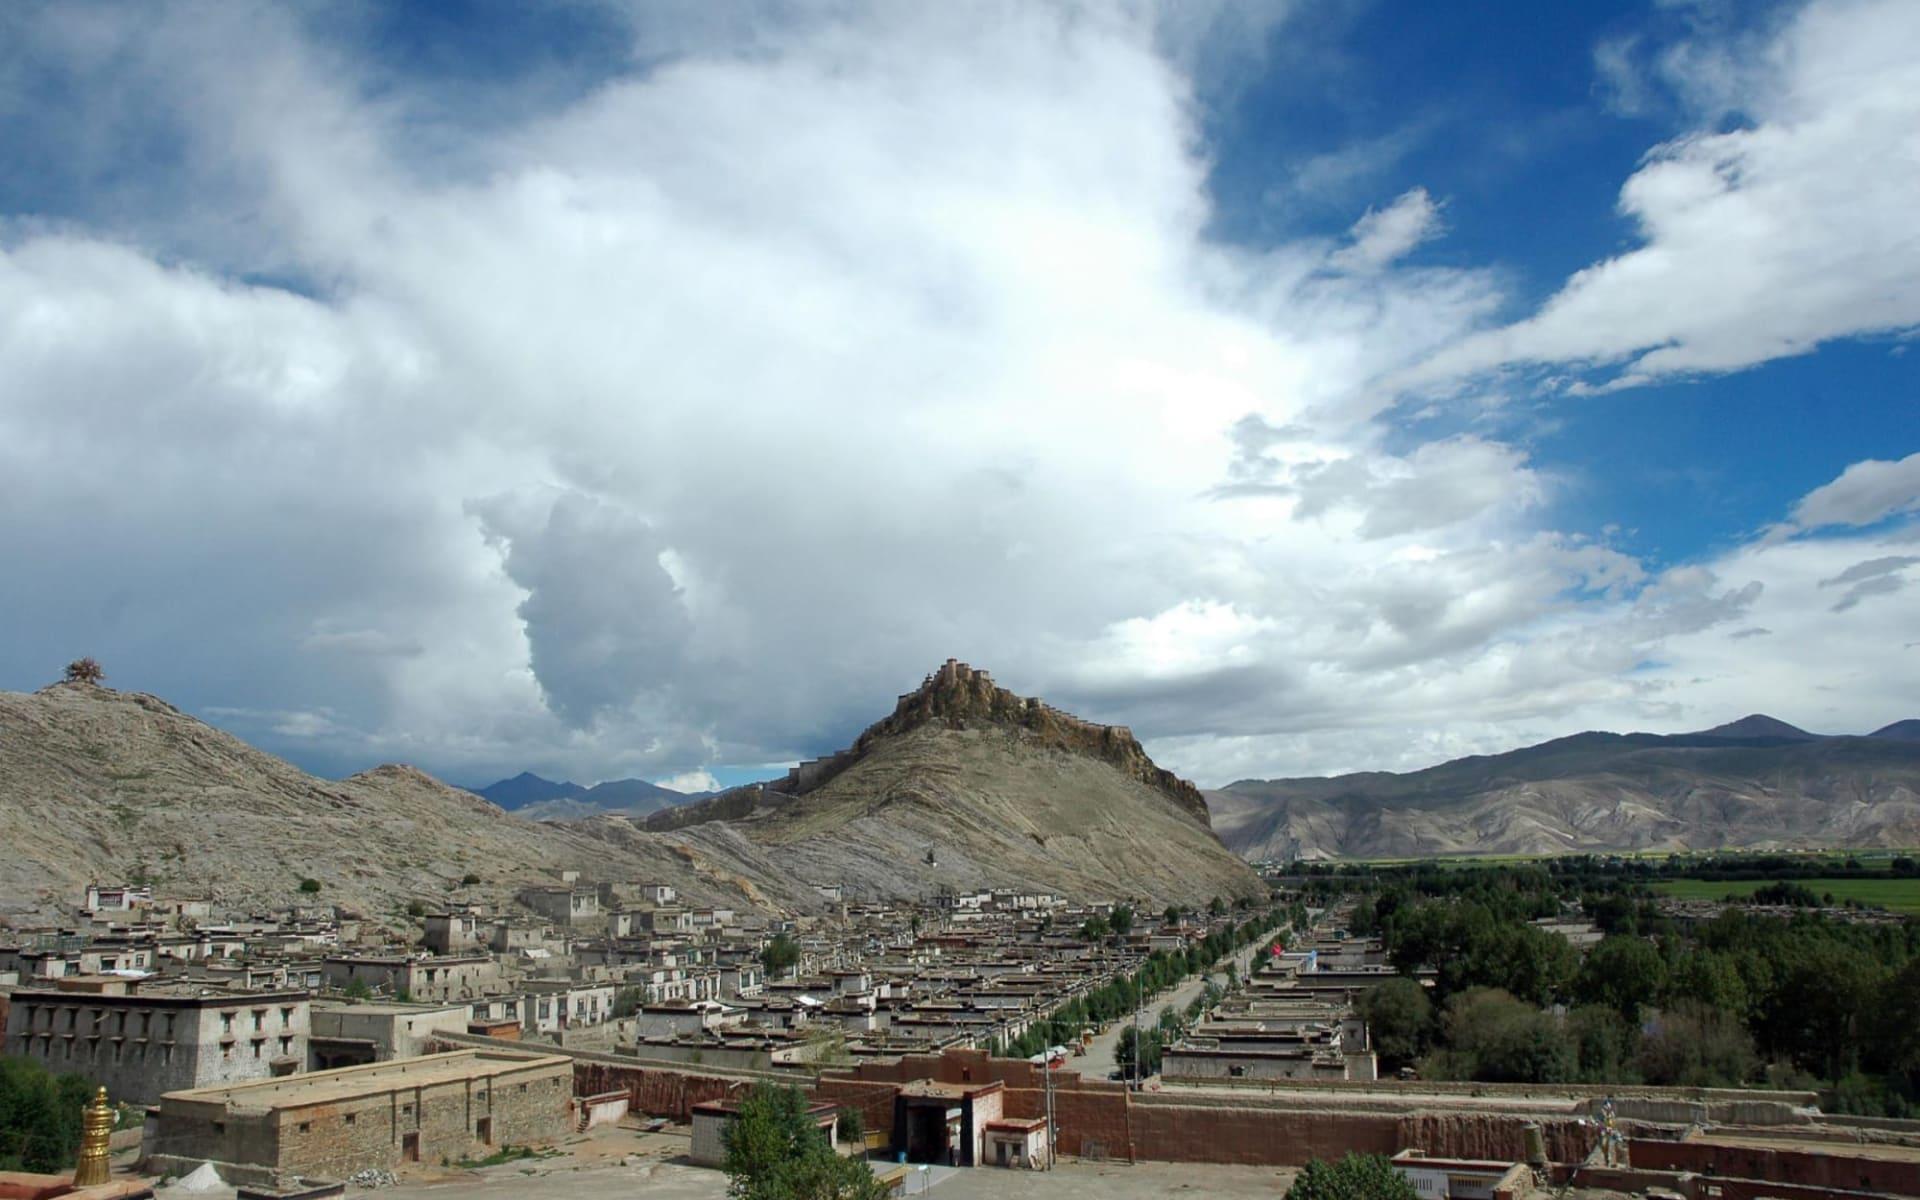 Die Magie des Tibets - Basis & Mt. Everest & Tsetang ab Lhasa: Gyantse overview